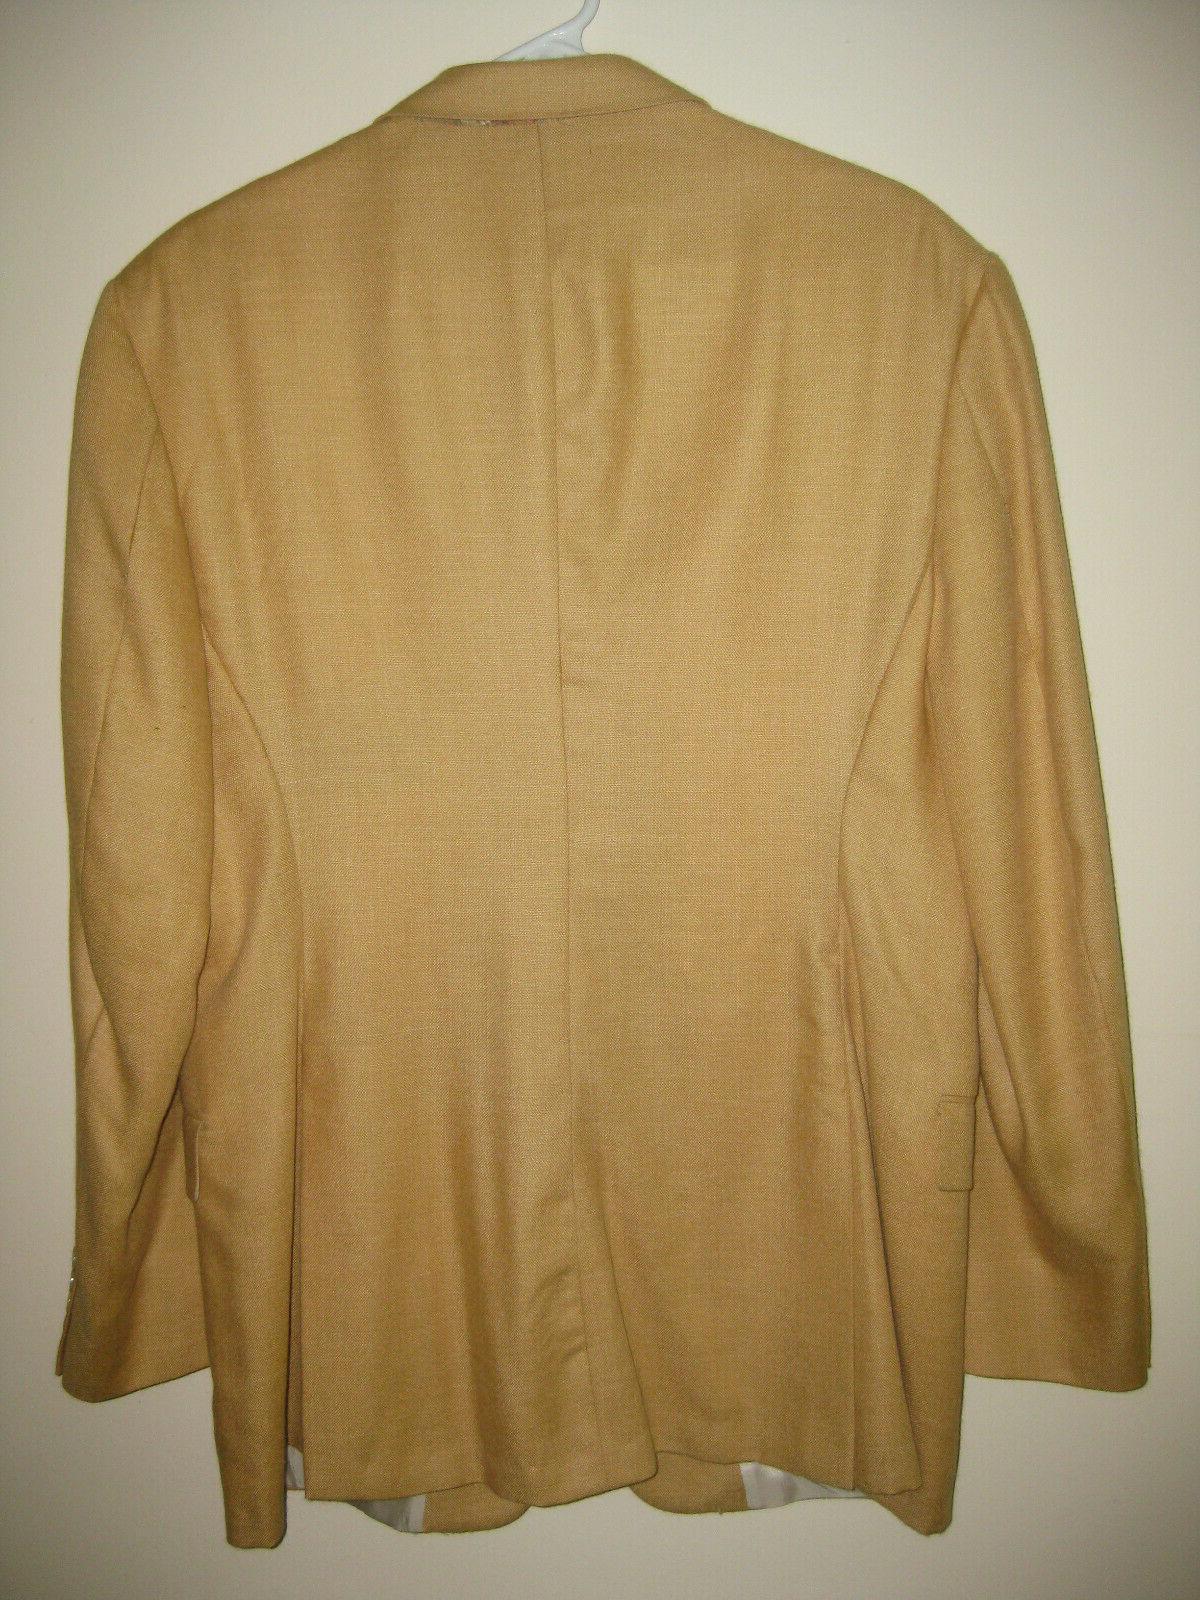 Men's BURBERRY London Camel Hair Jacket